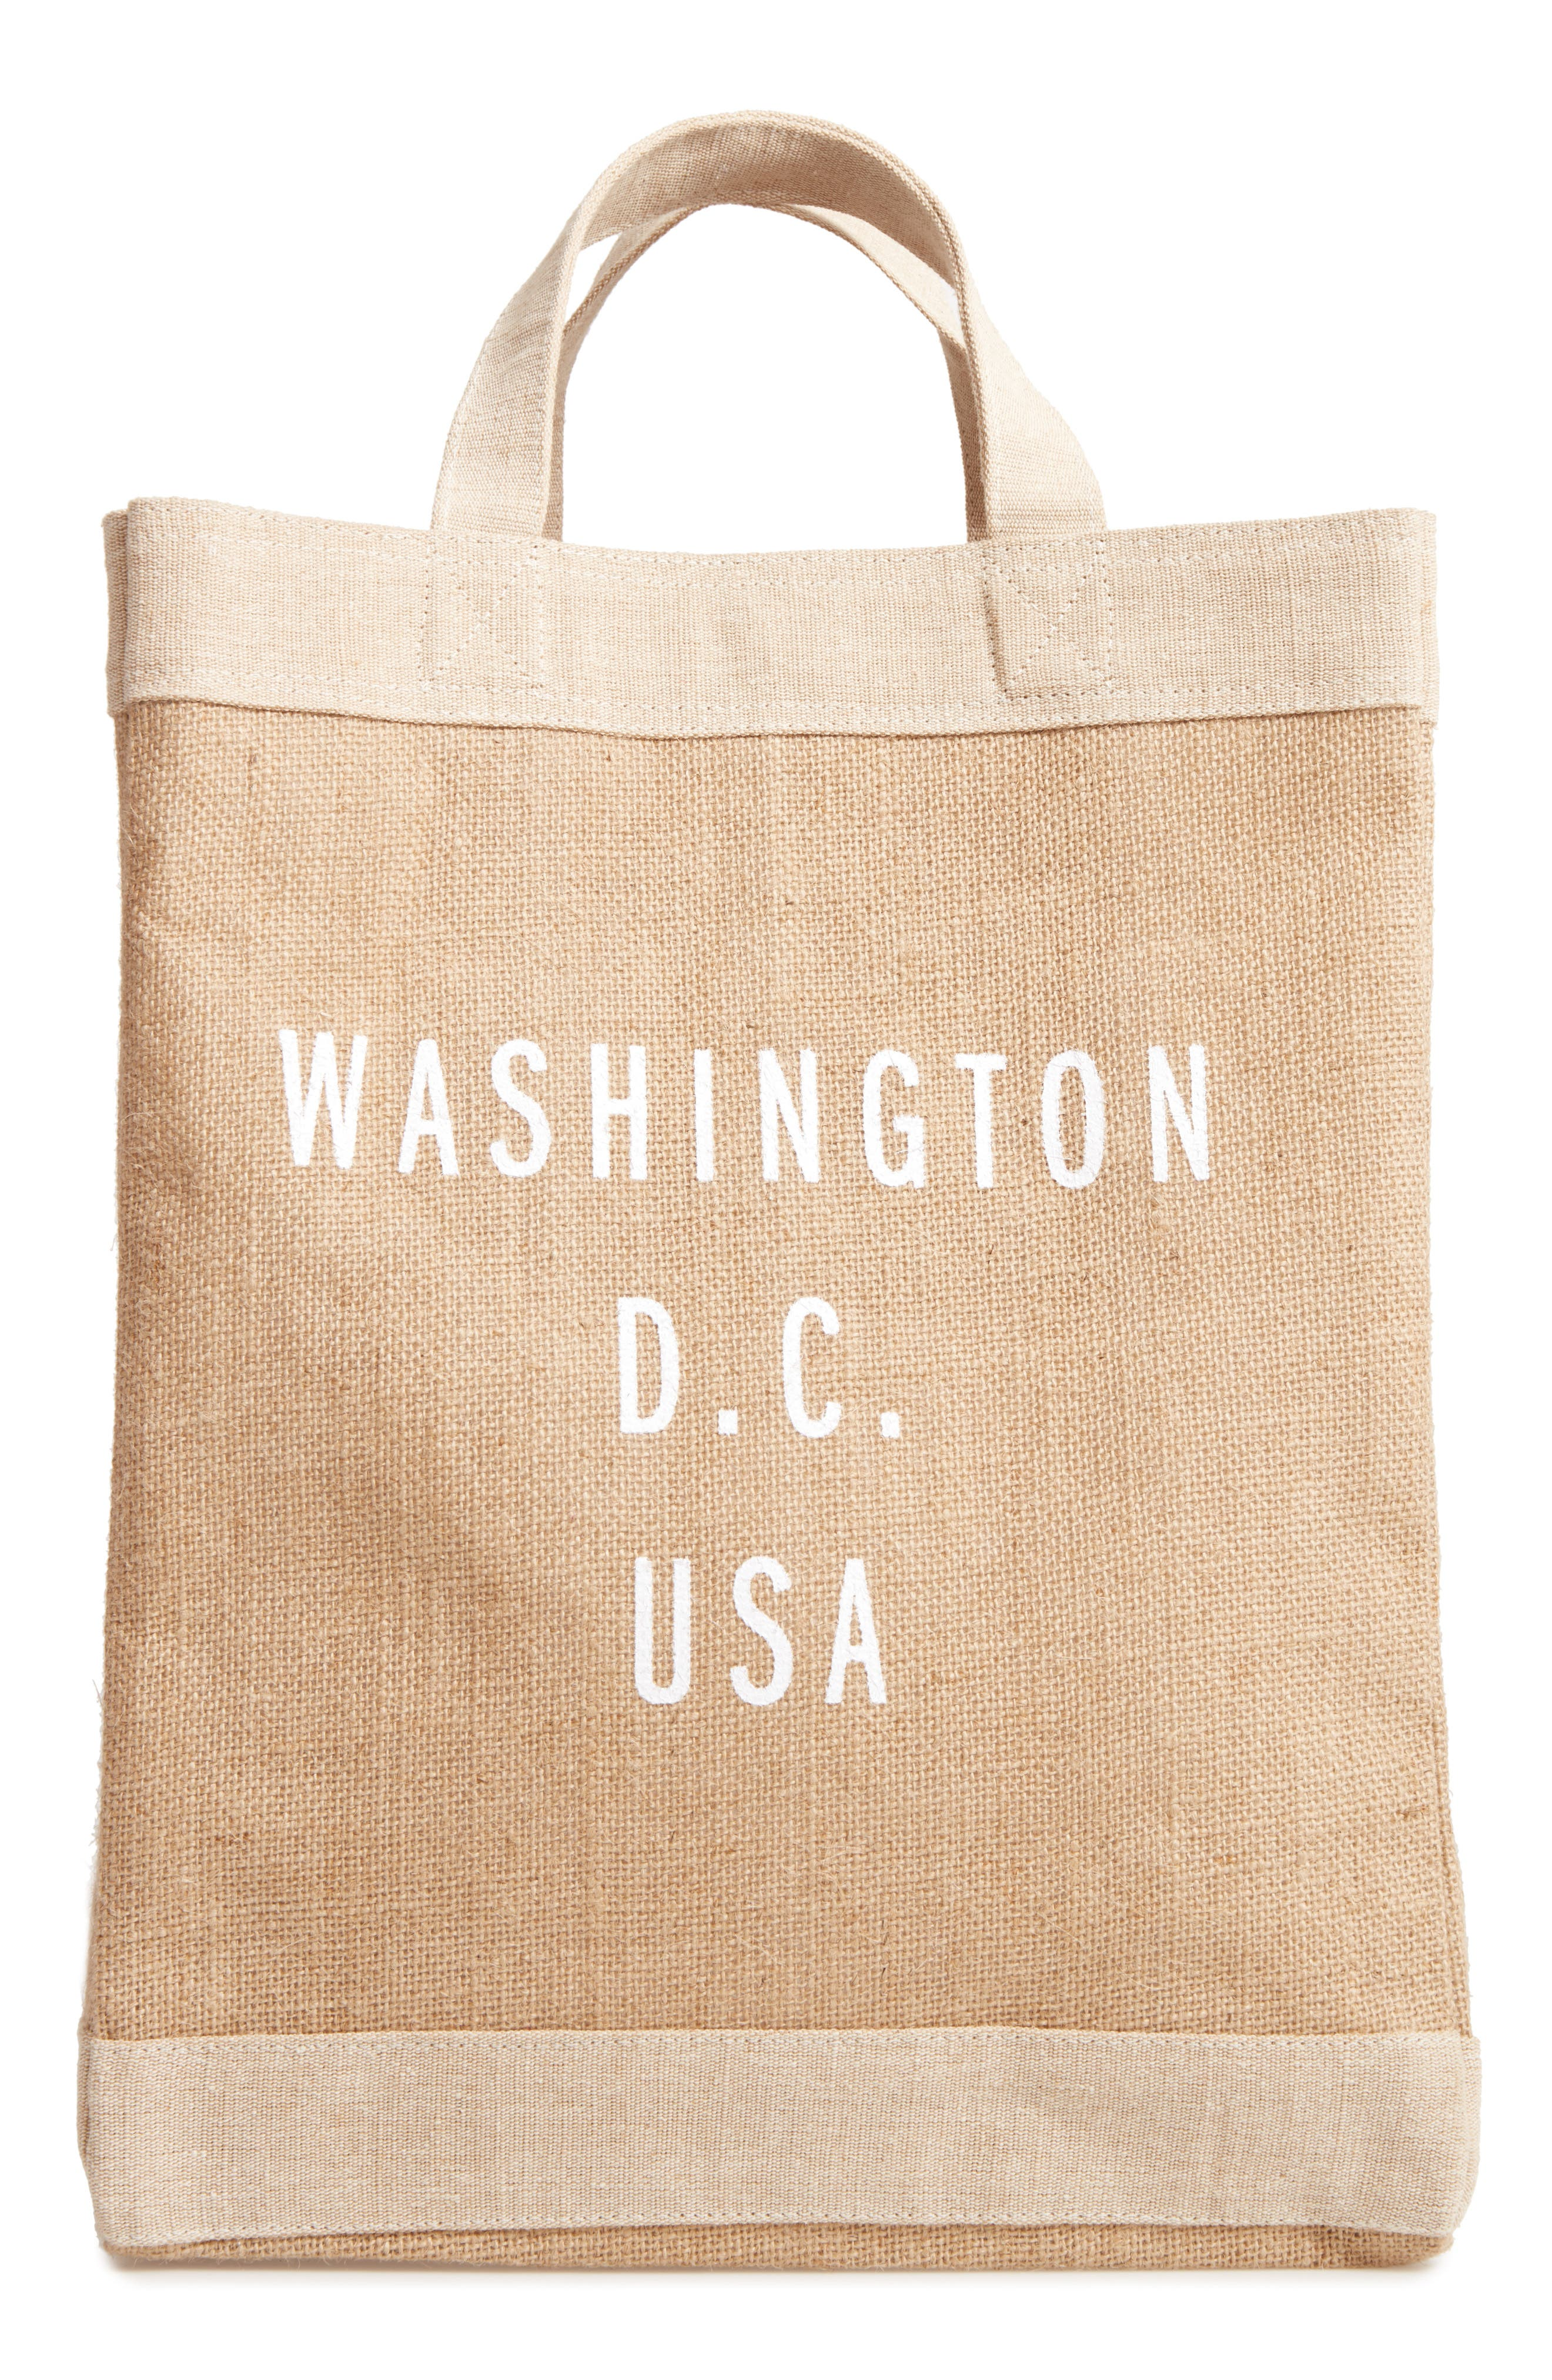 Apolis Washington D.C. Simple Market Bag